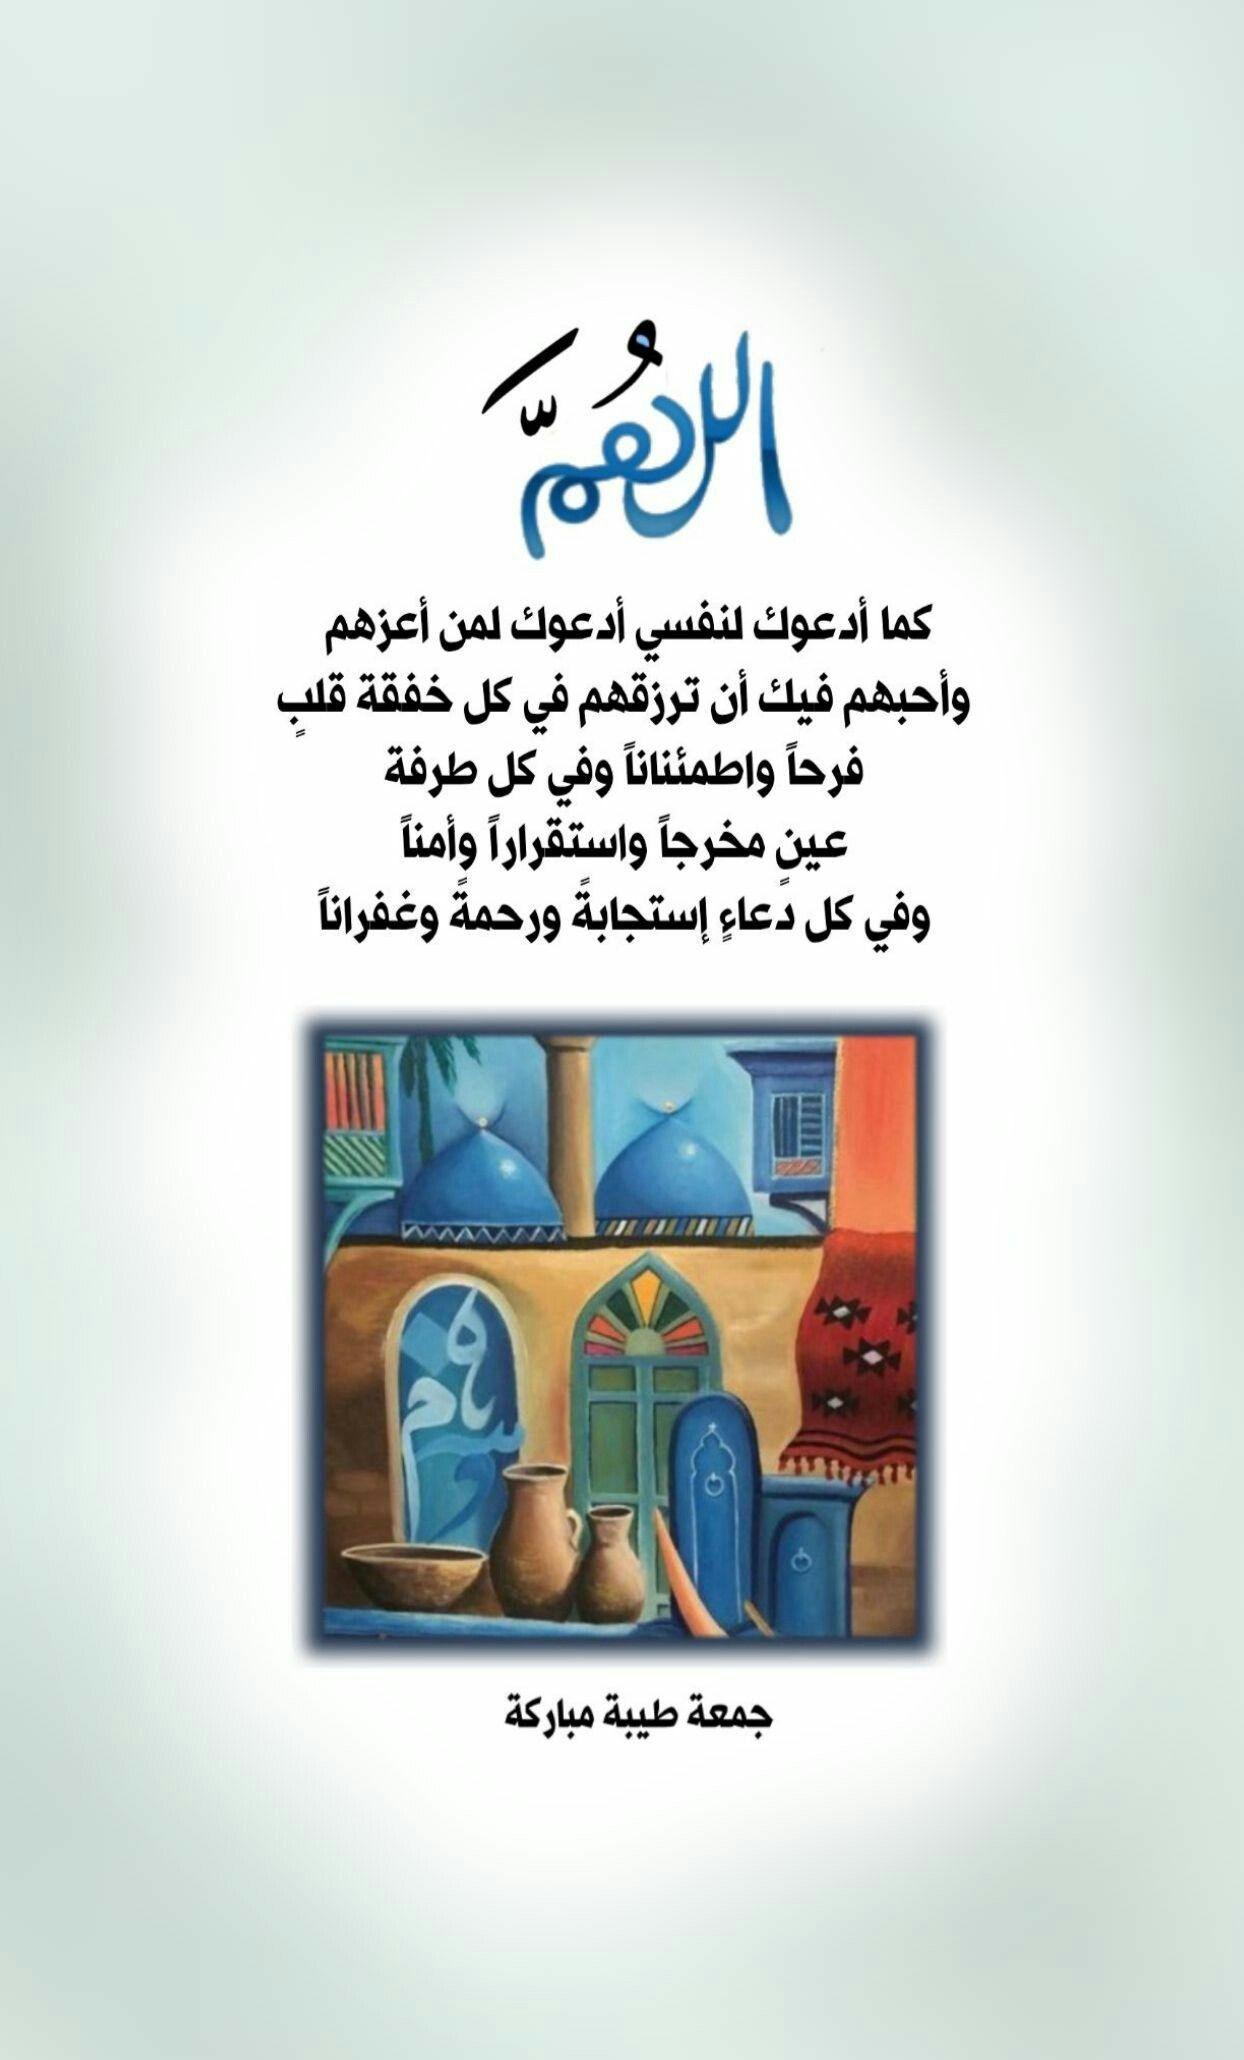 Pin By Mouna Kb On جمعة مباركة Islamic Phrases Photo Quotes Islamic Quotes Quran